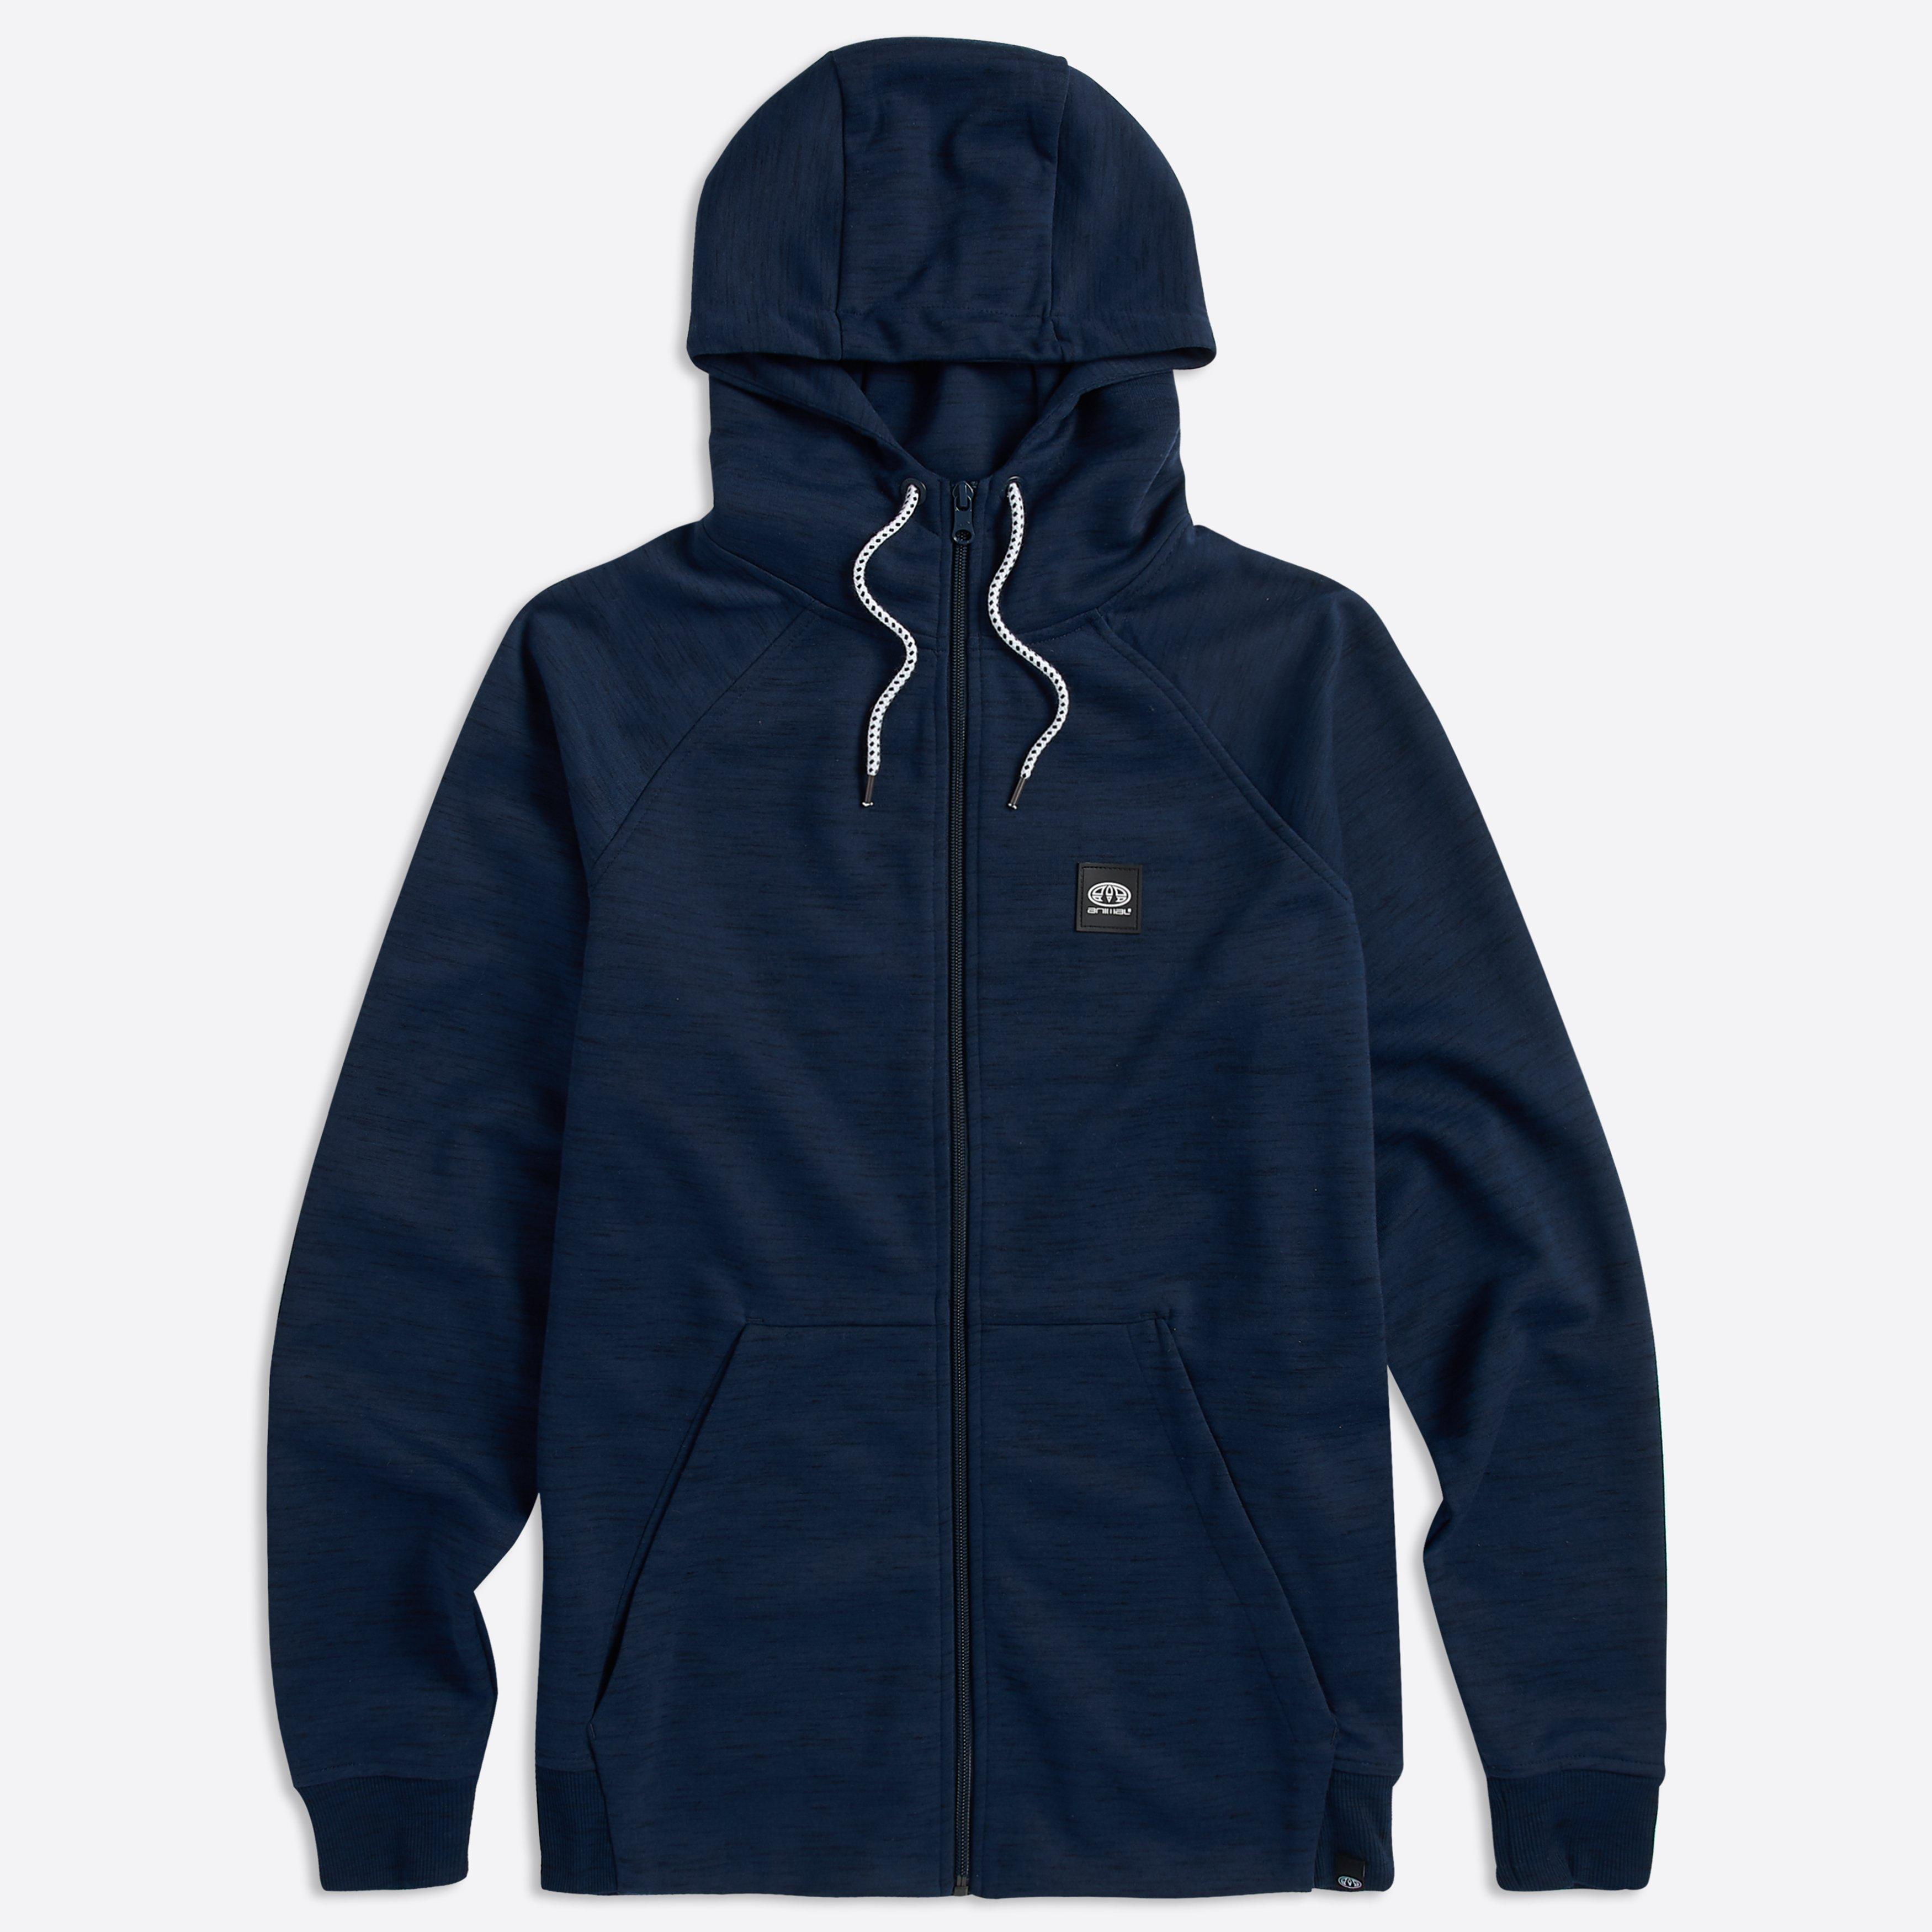 Animal Clothing Men's Venture Zip Jacket Various Colours 5057652285496 - S Navy